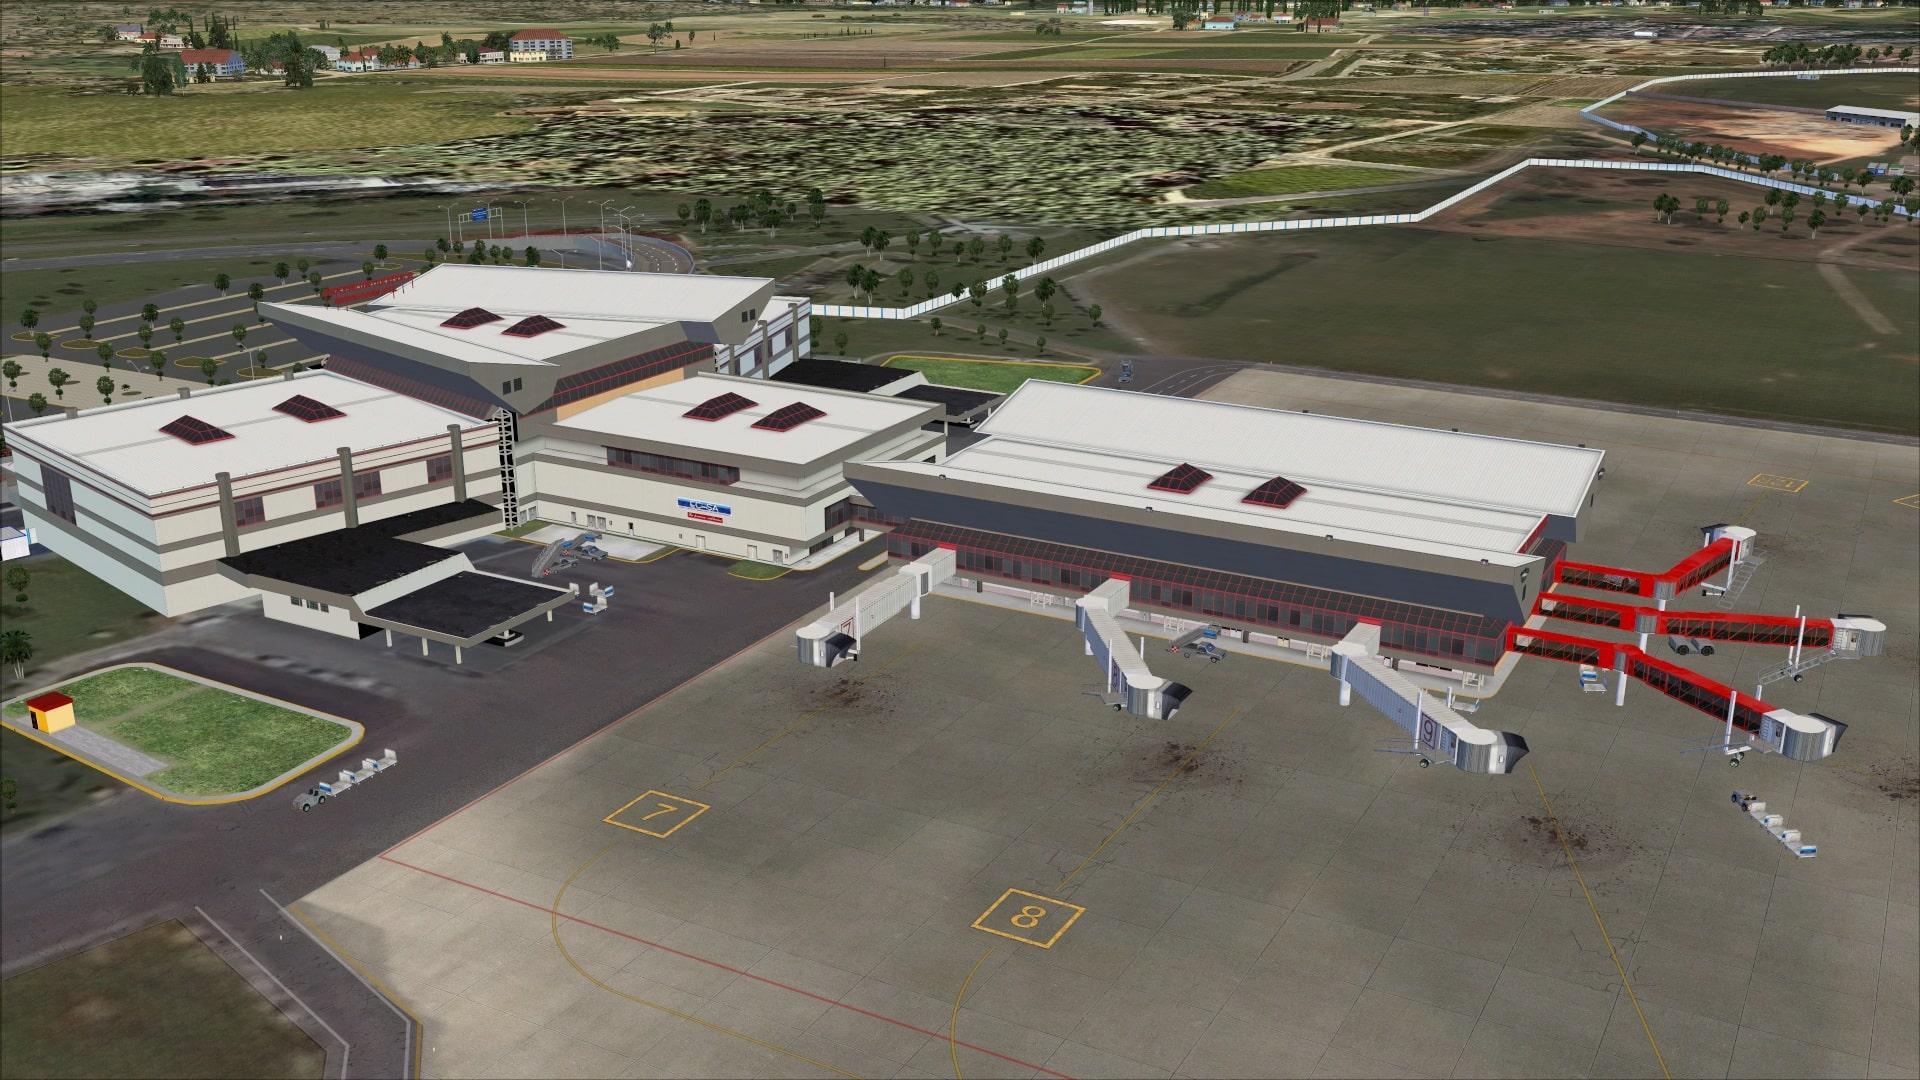 Aeroporto Havana : Review of taxi gate la habana cuba muha fsx josé